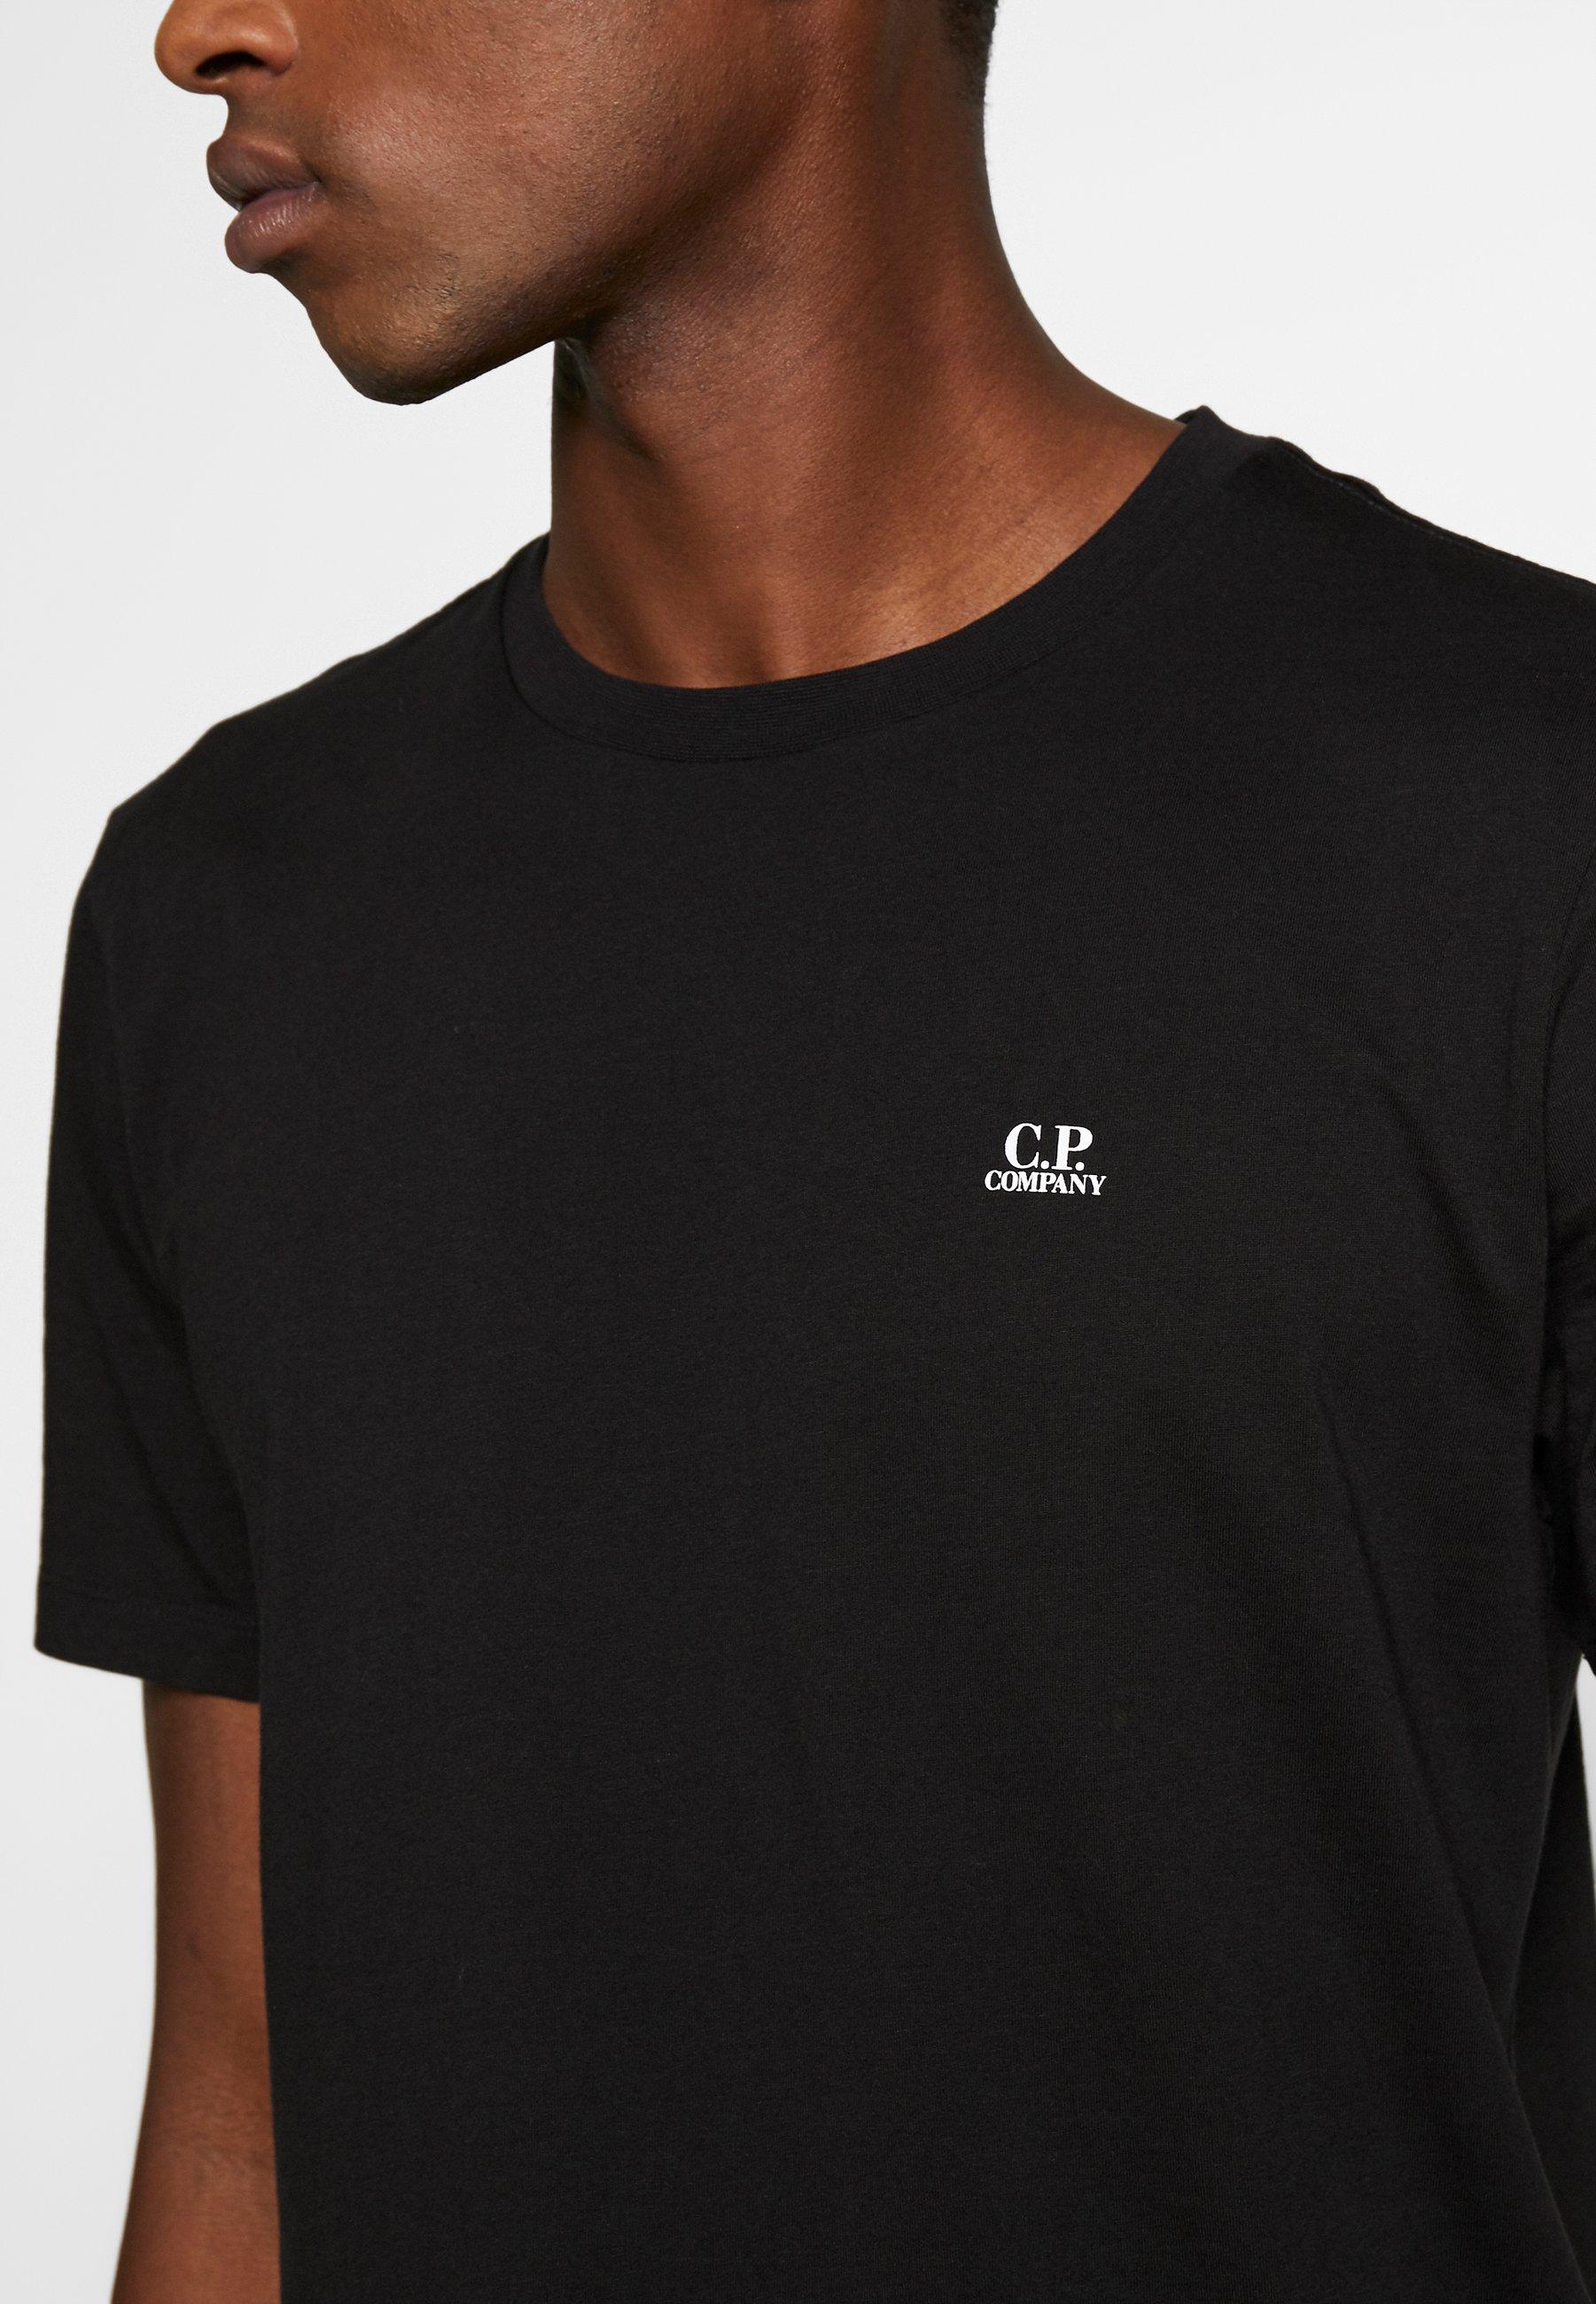 C.p. Company Small Logo - T-shirt Bas Black